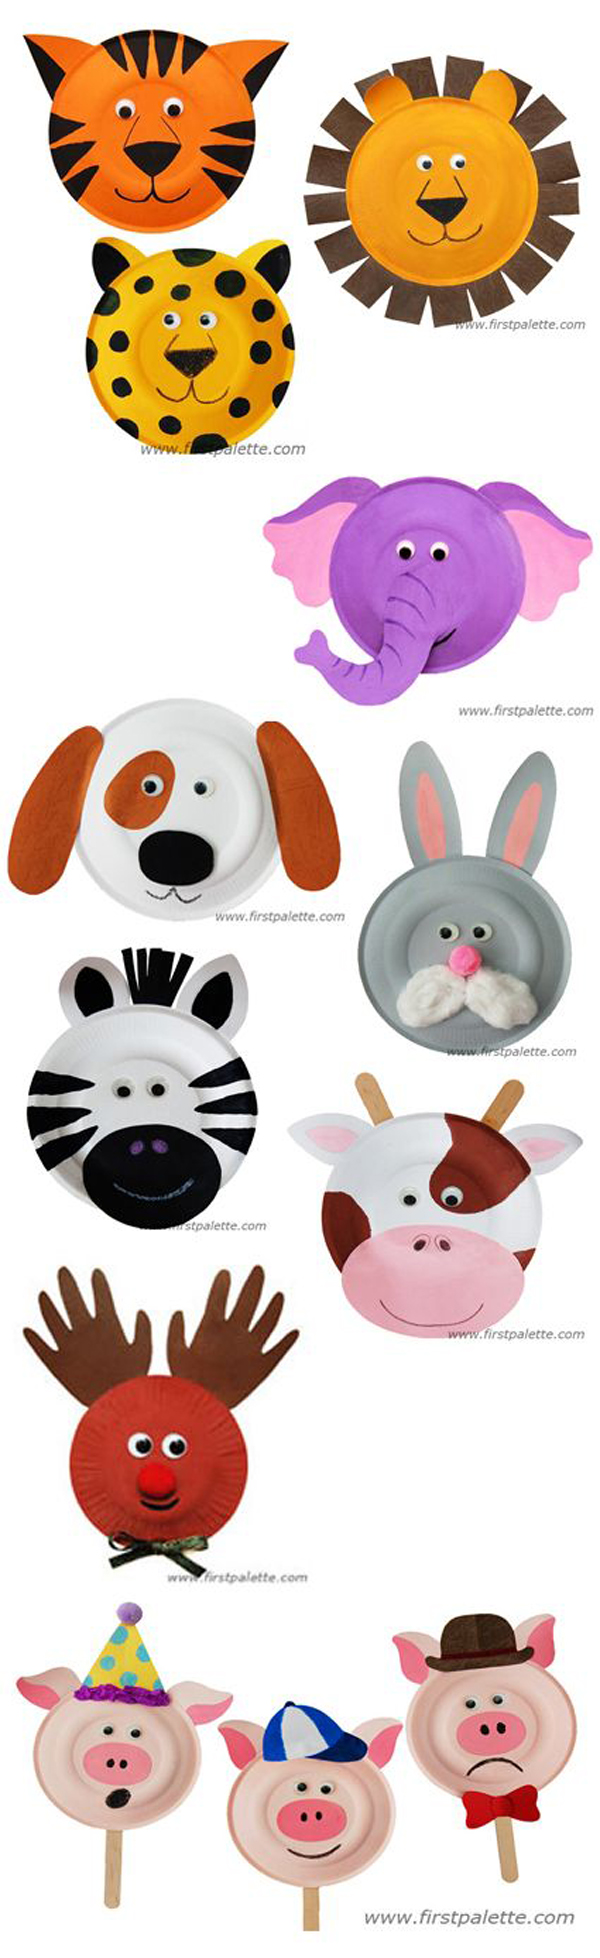 manualidades-infantiles-platos-caras-animales